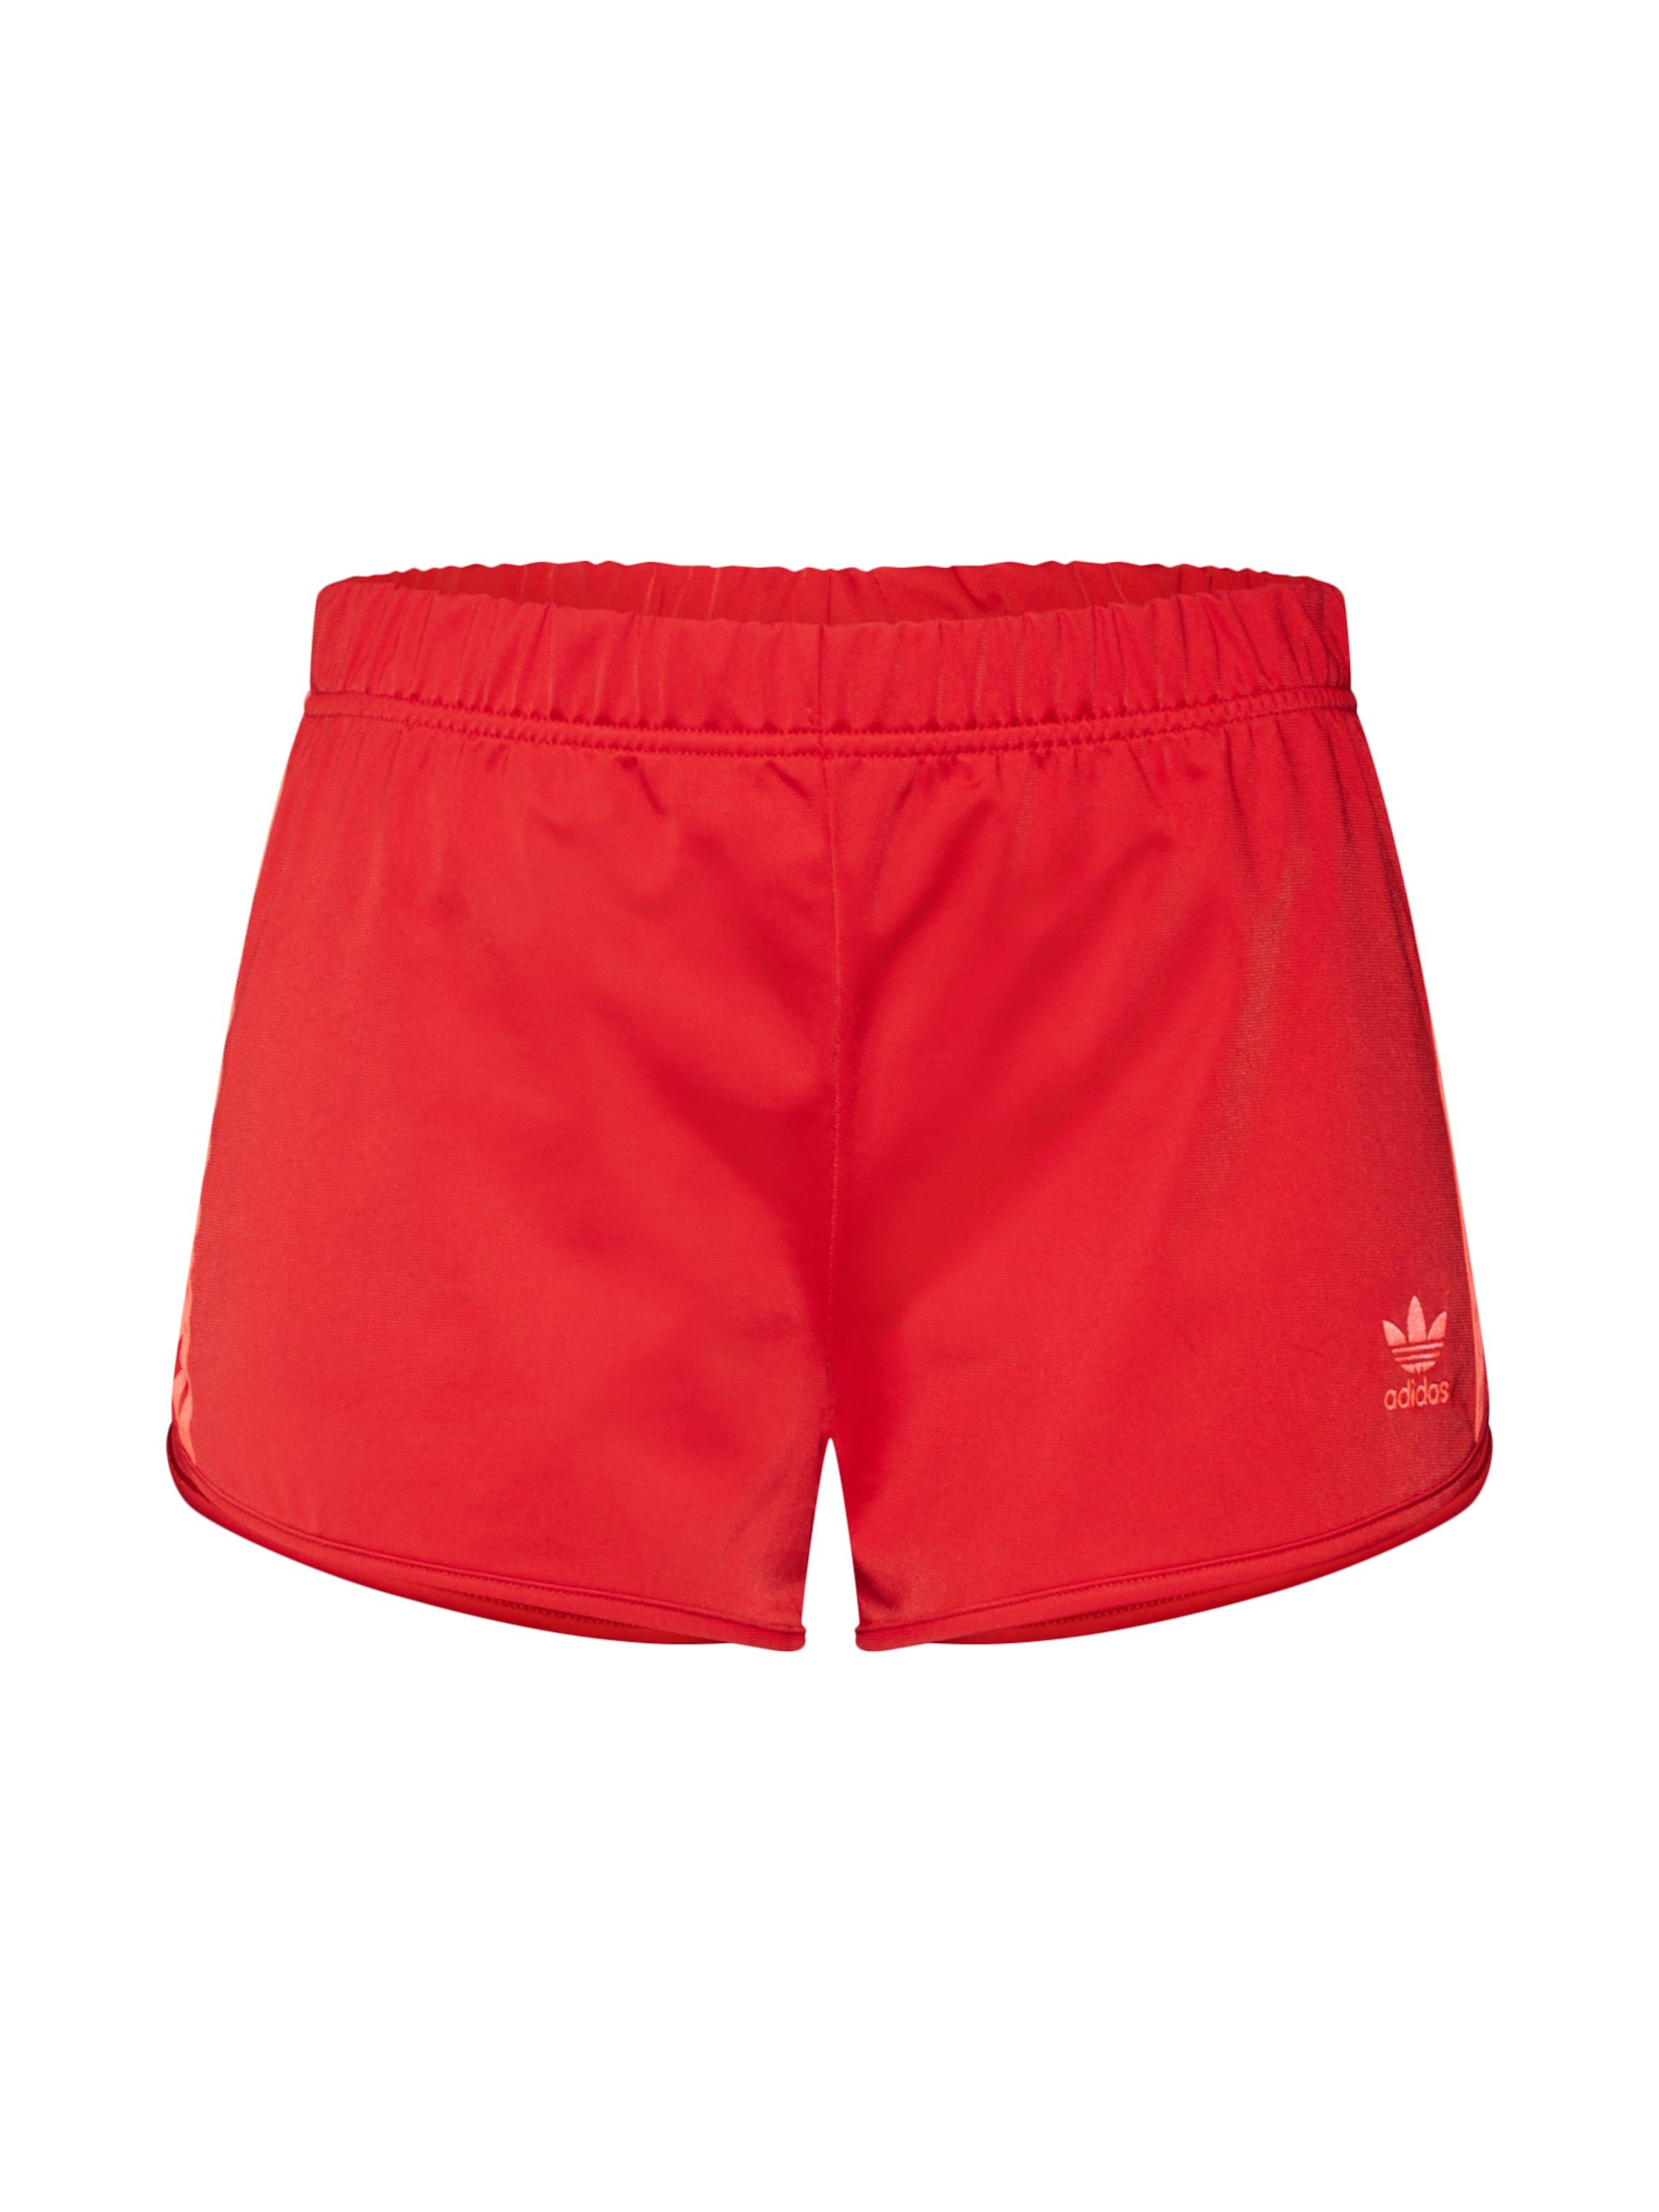 Originals Pantalon Str Adidas En '3 Rouge Short' n80OkPw